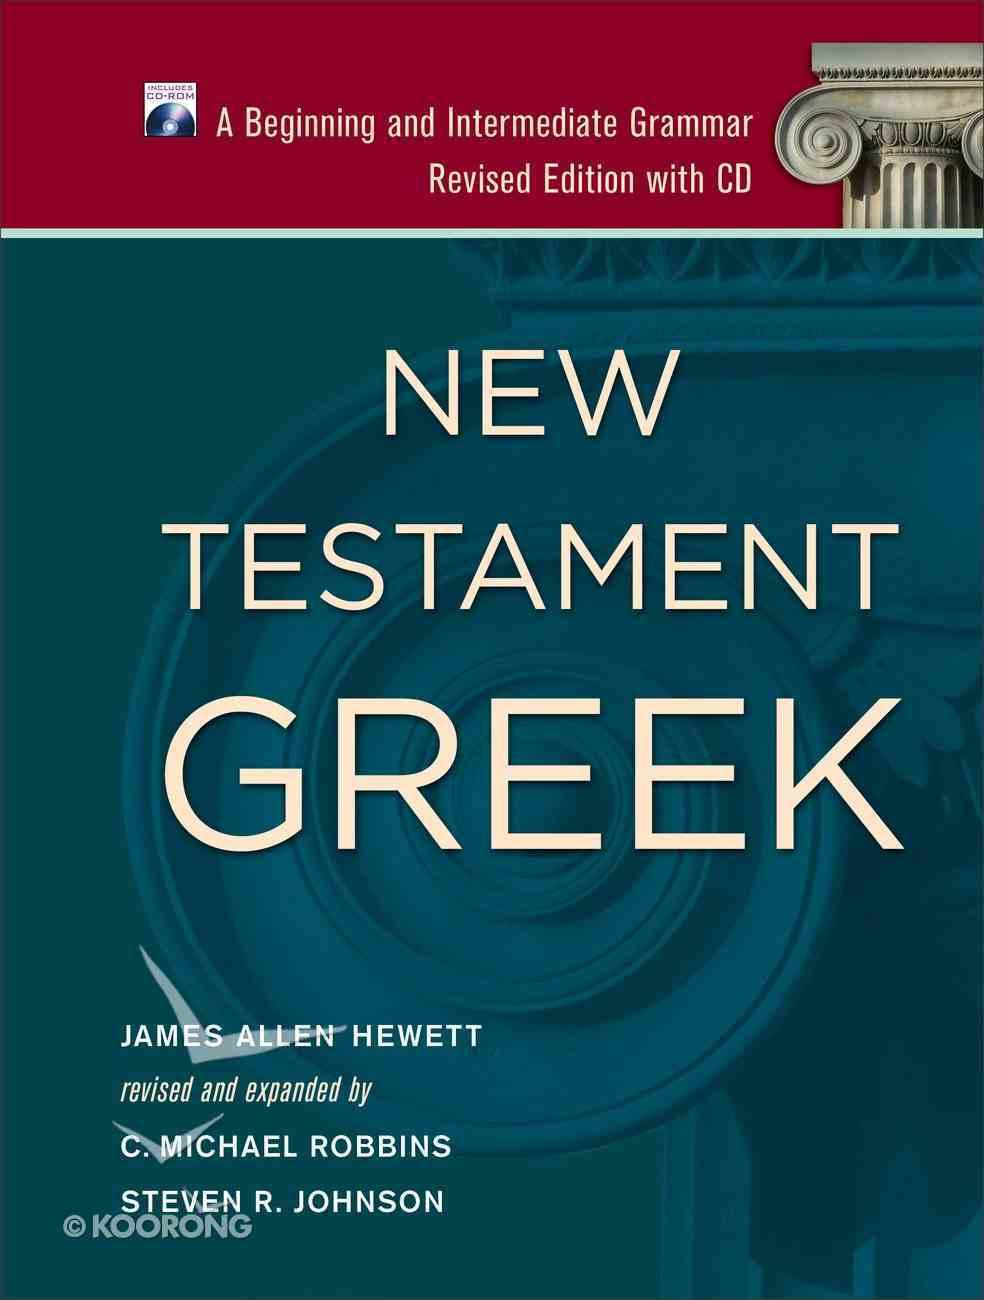 New Testament Greek: A Beginning and Intermediate Grammar (With Cd) Hardback